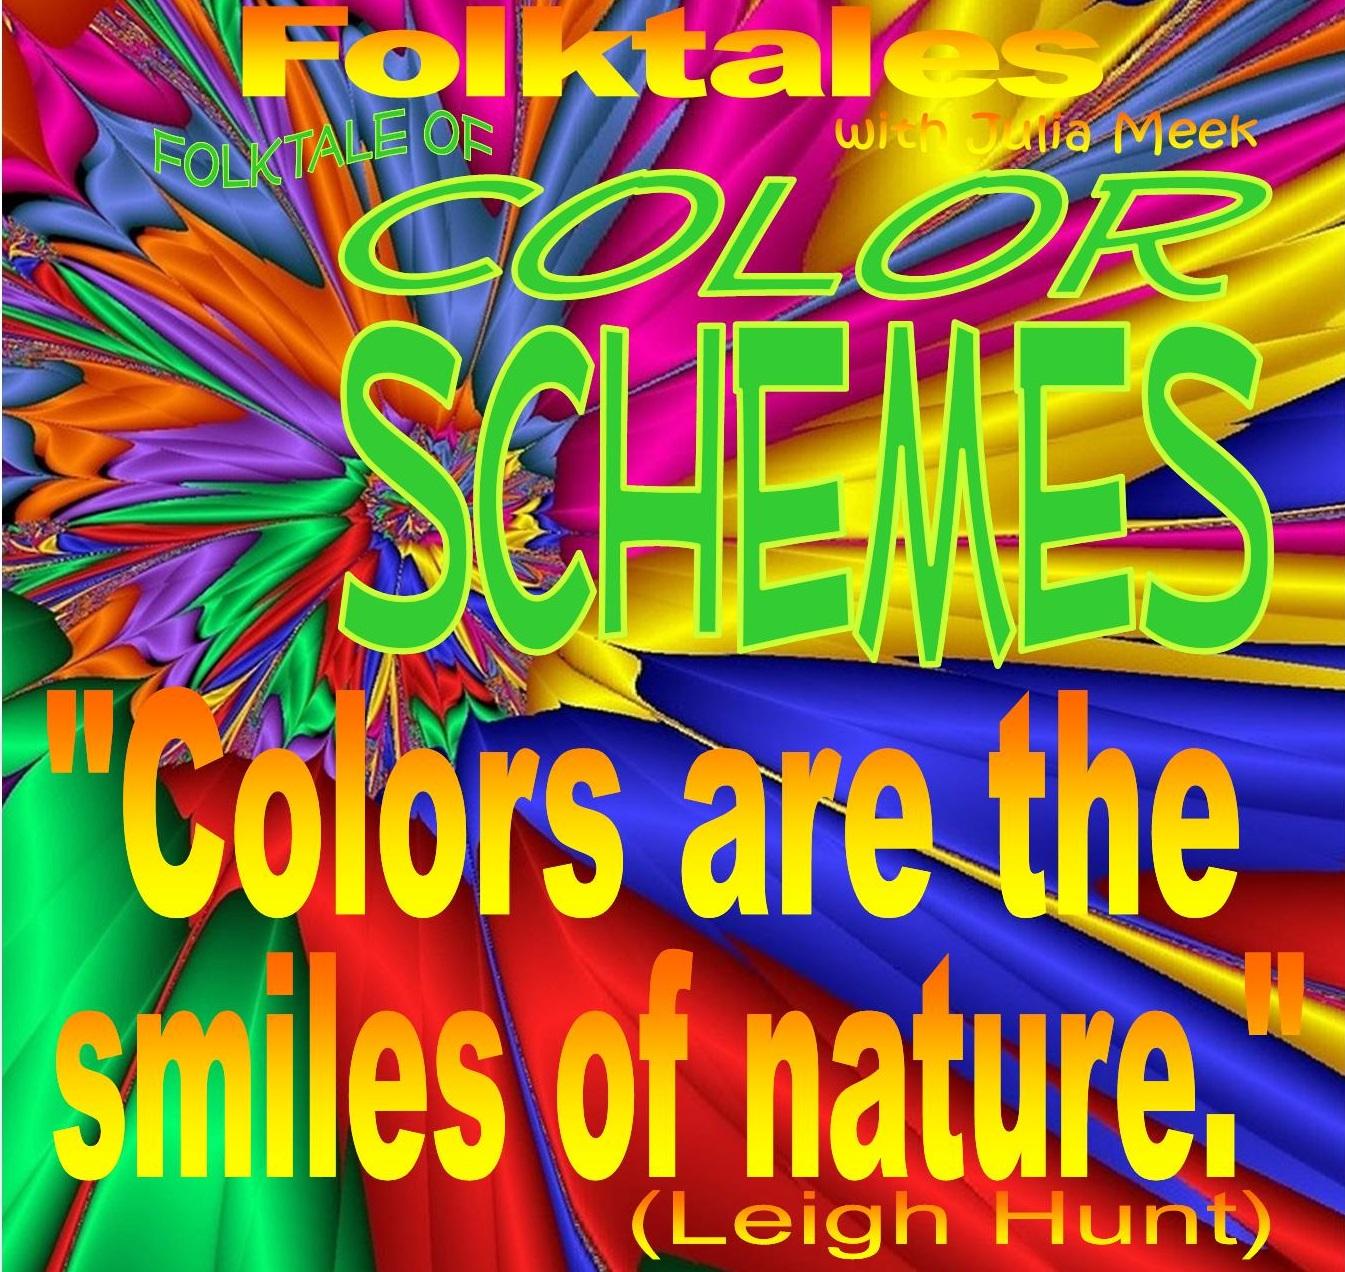 Caption: WBOI's Folktale of Color Schemes, Credit: Julia Meek